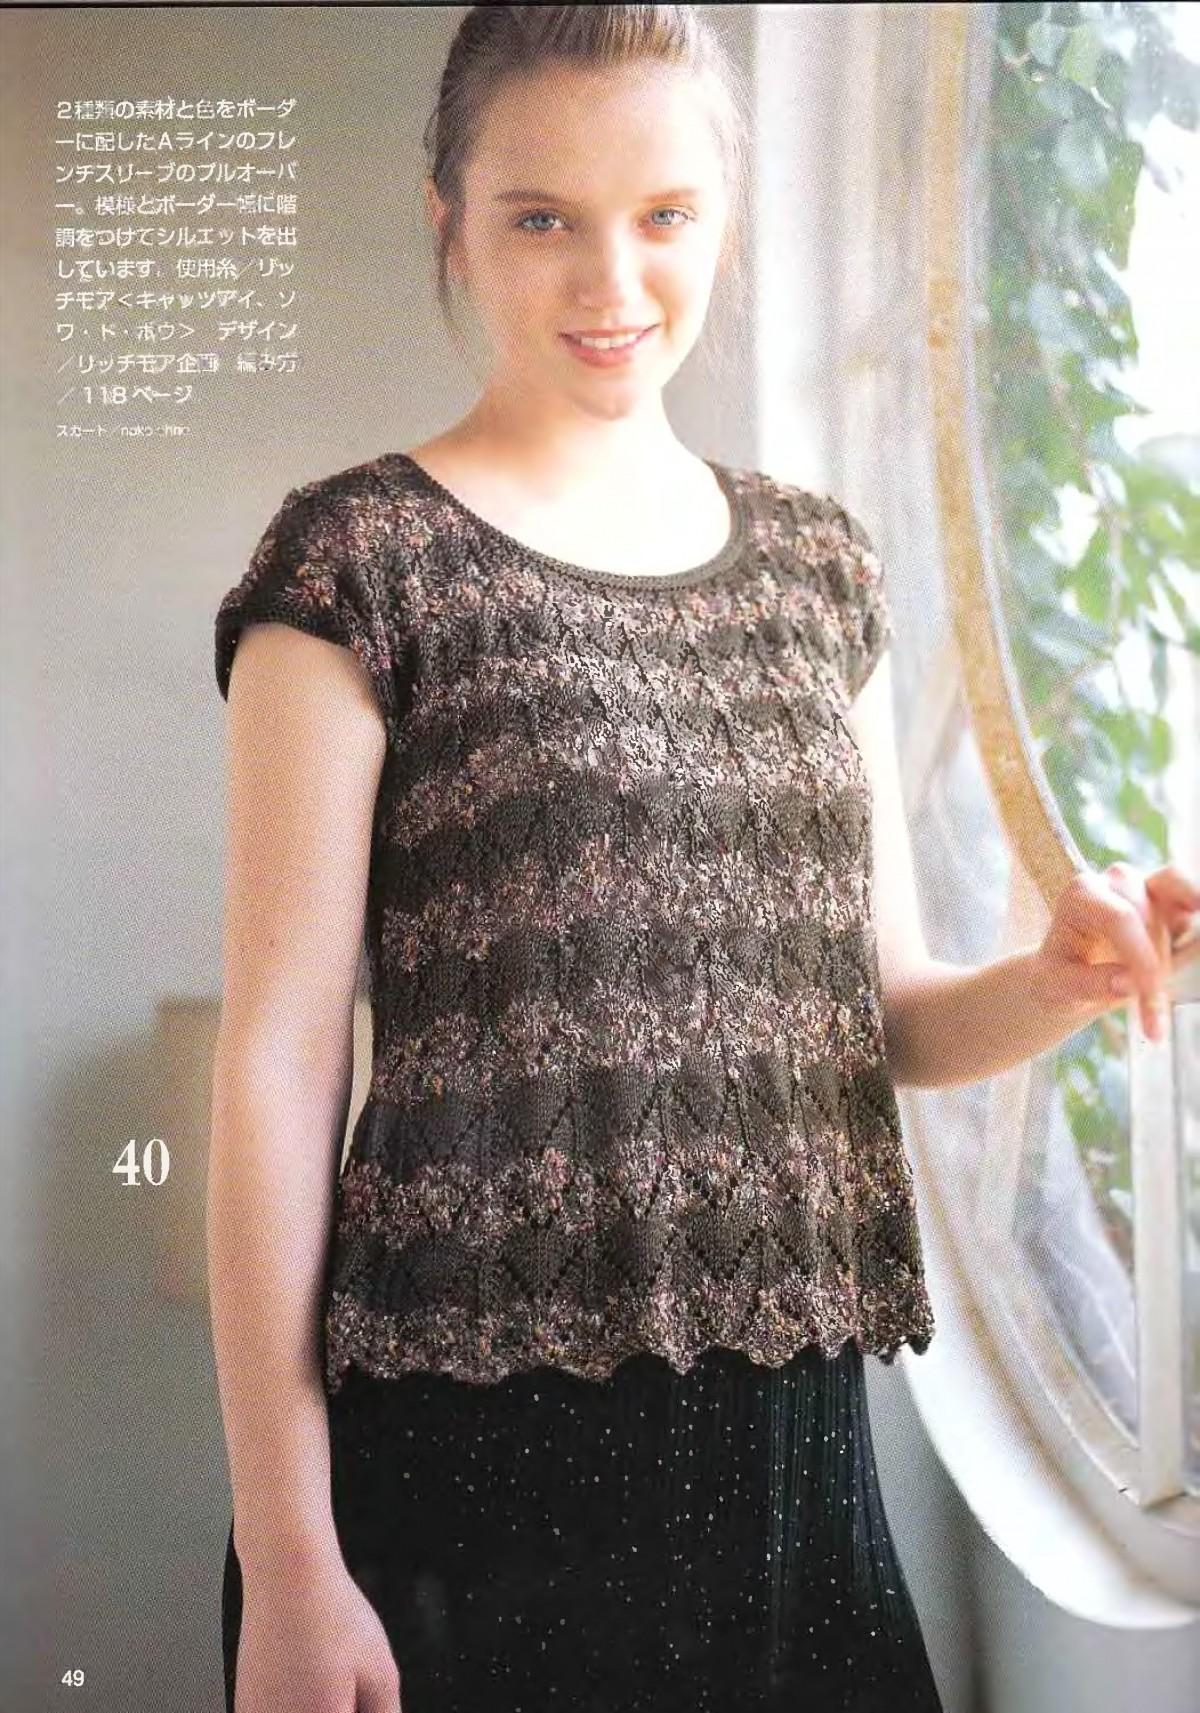 Lets-knit-series-NV4359-2008-Spring-Summer-sp-kr_47.jpg